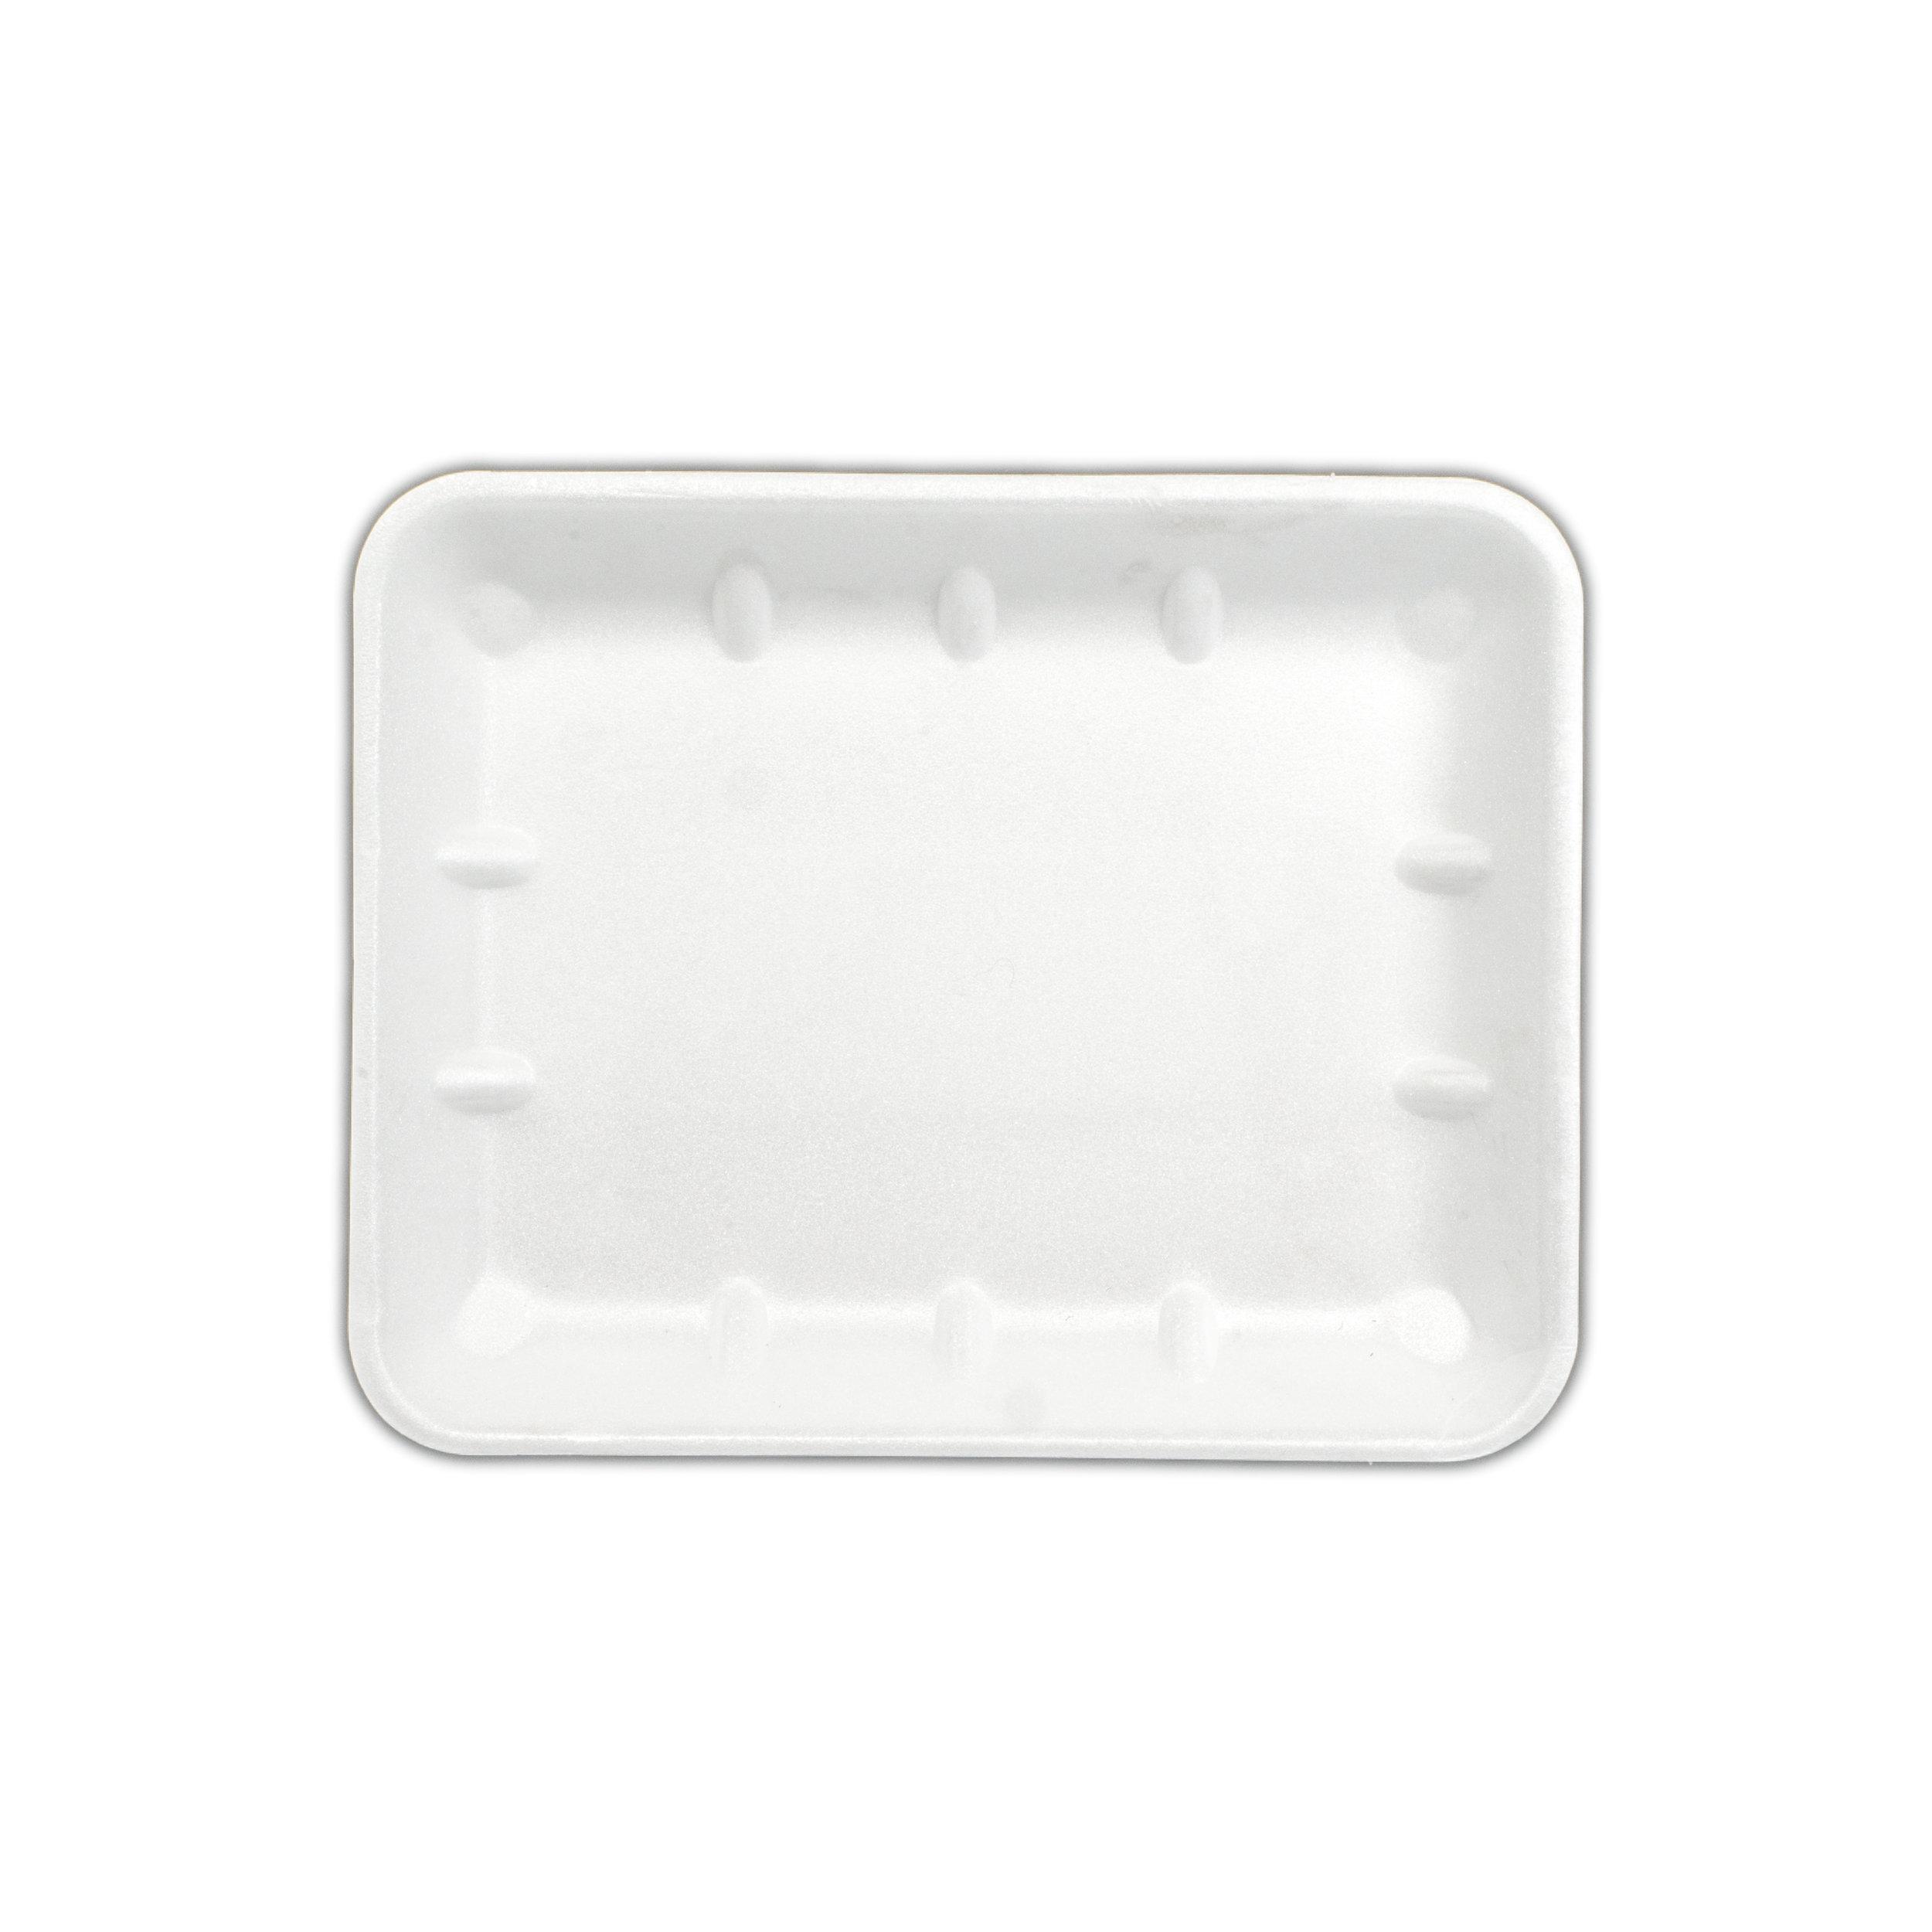 iK0209 CLOSED CELL D  EEP 11x9 WHITE   90 per sleeve 360 per carton